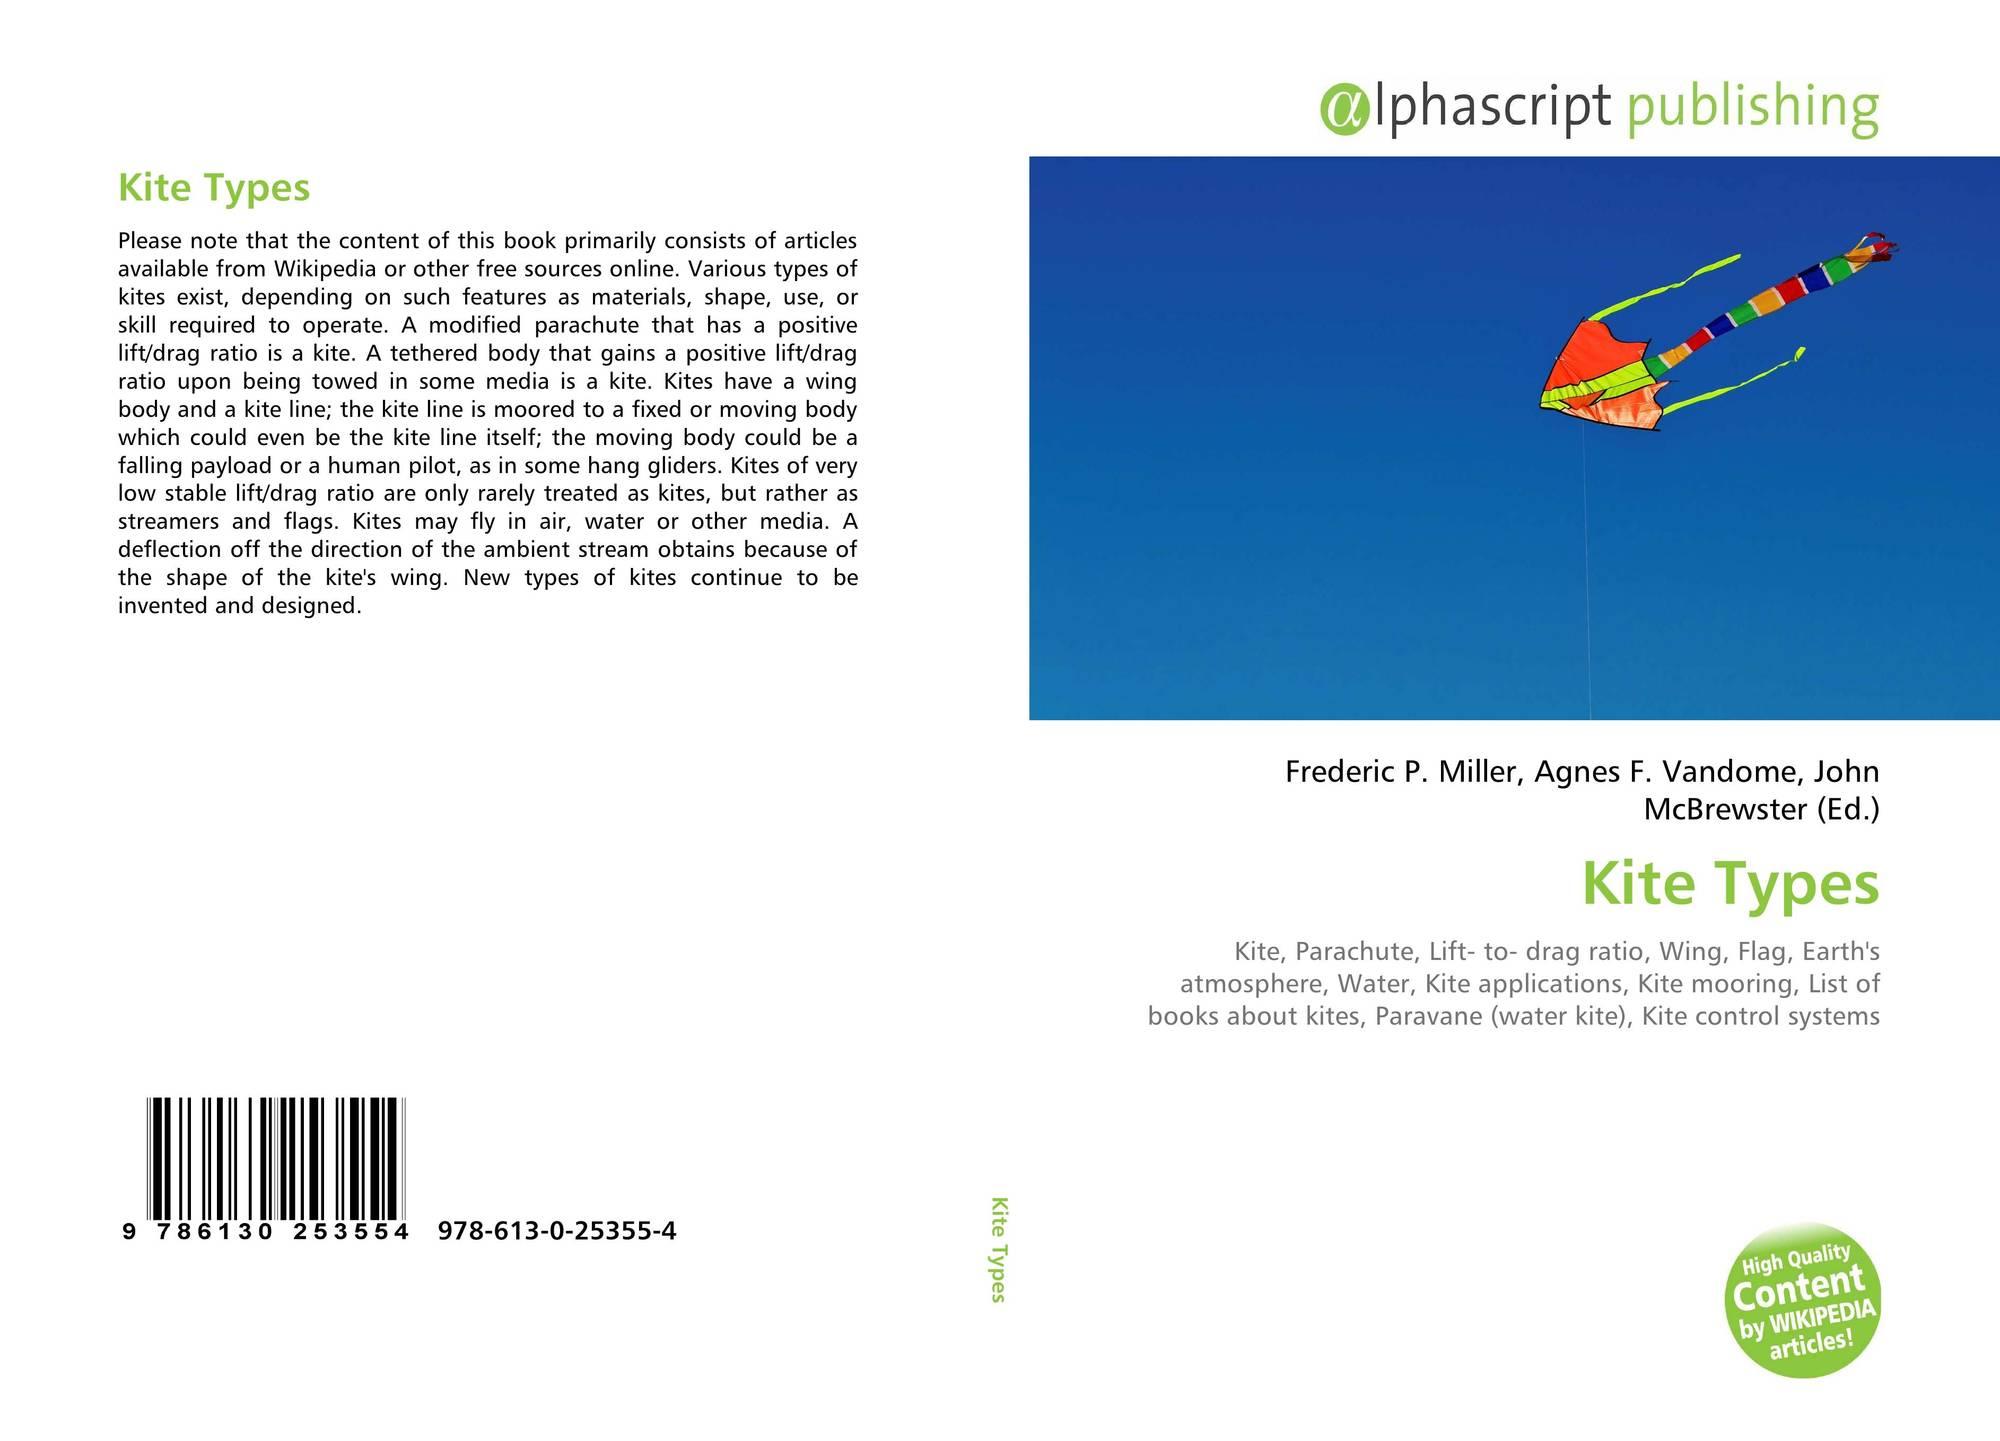 Kite Types, 978-613-0-25355-4, 6130253559 ,9786130253554